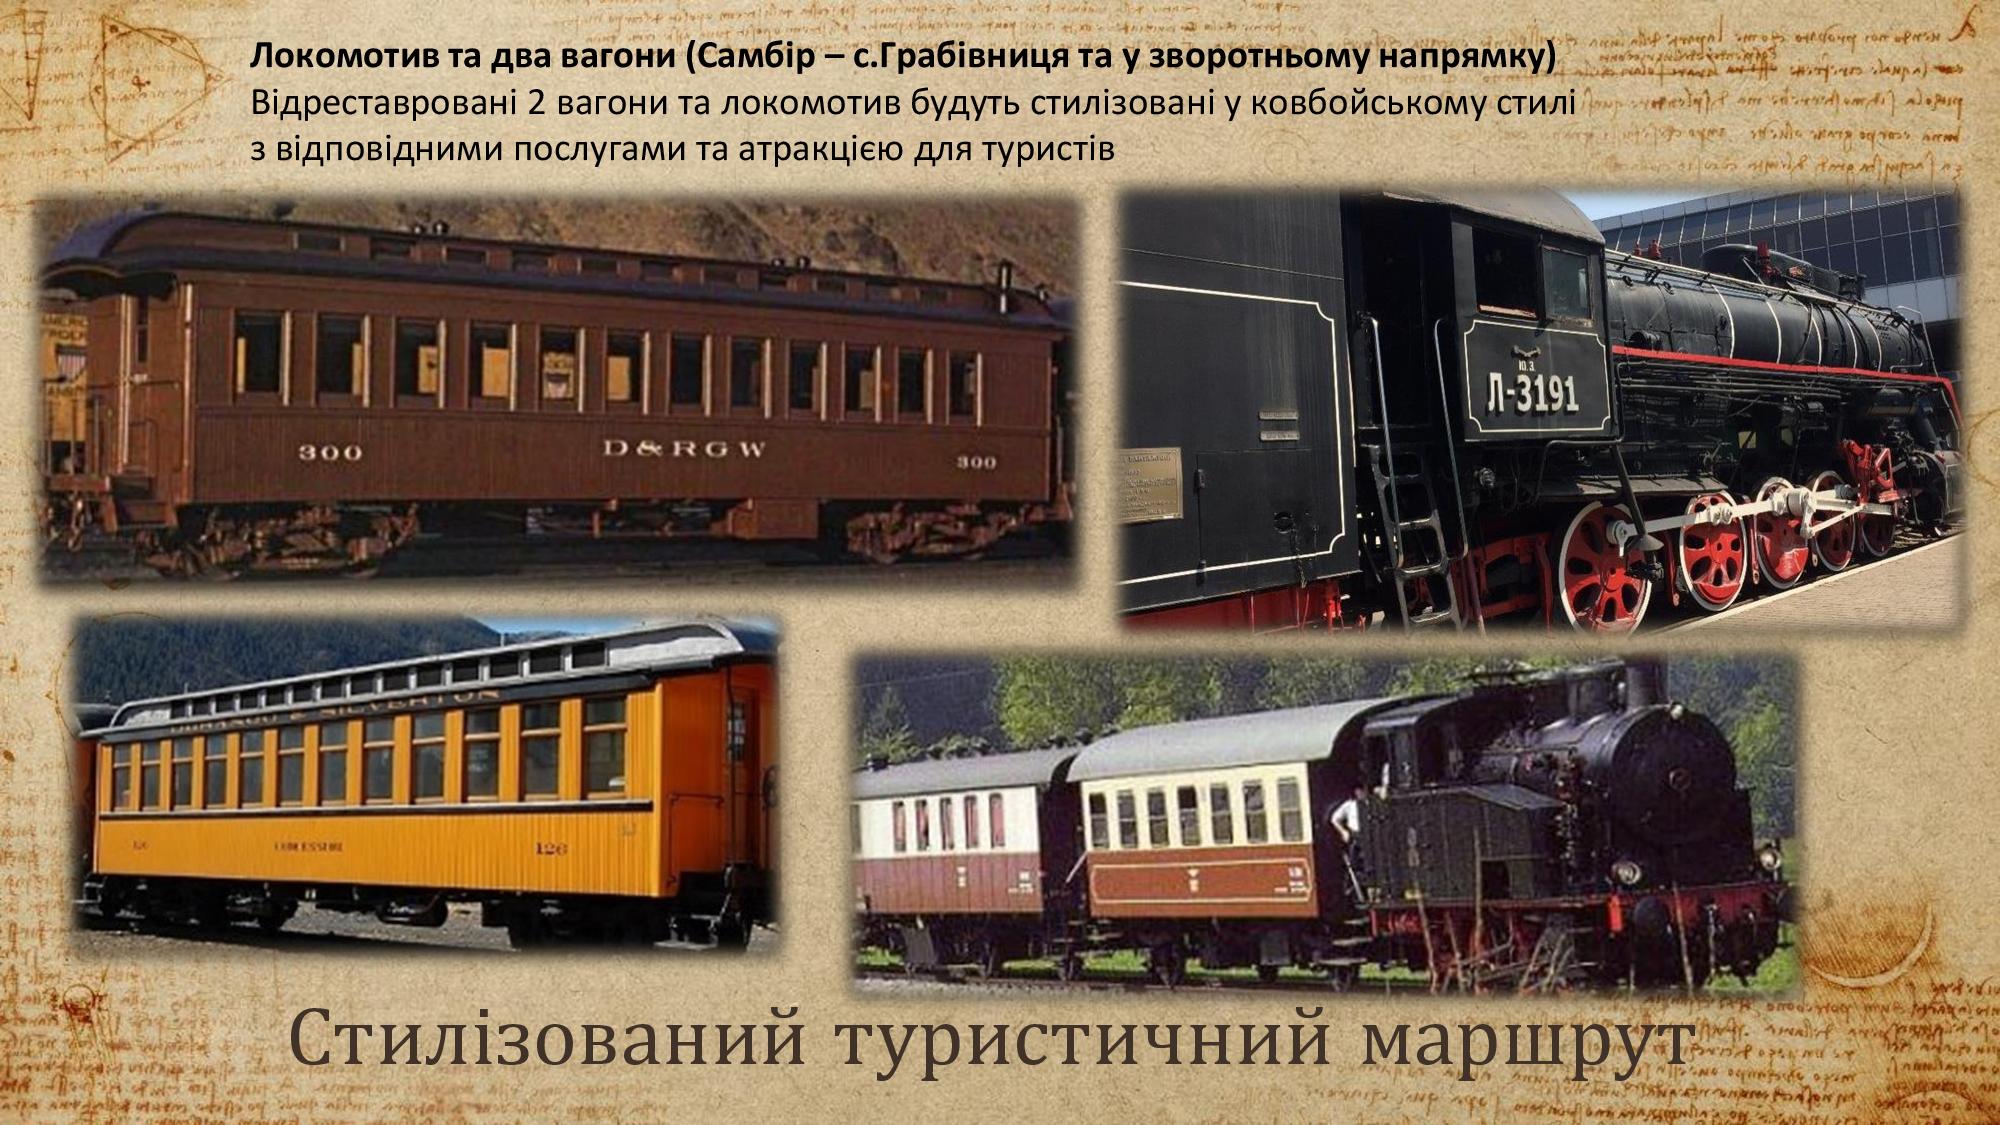 content_1456035_1508473.jpg